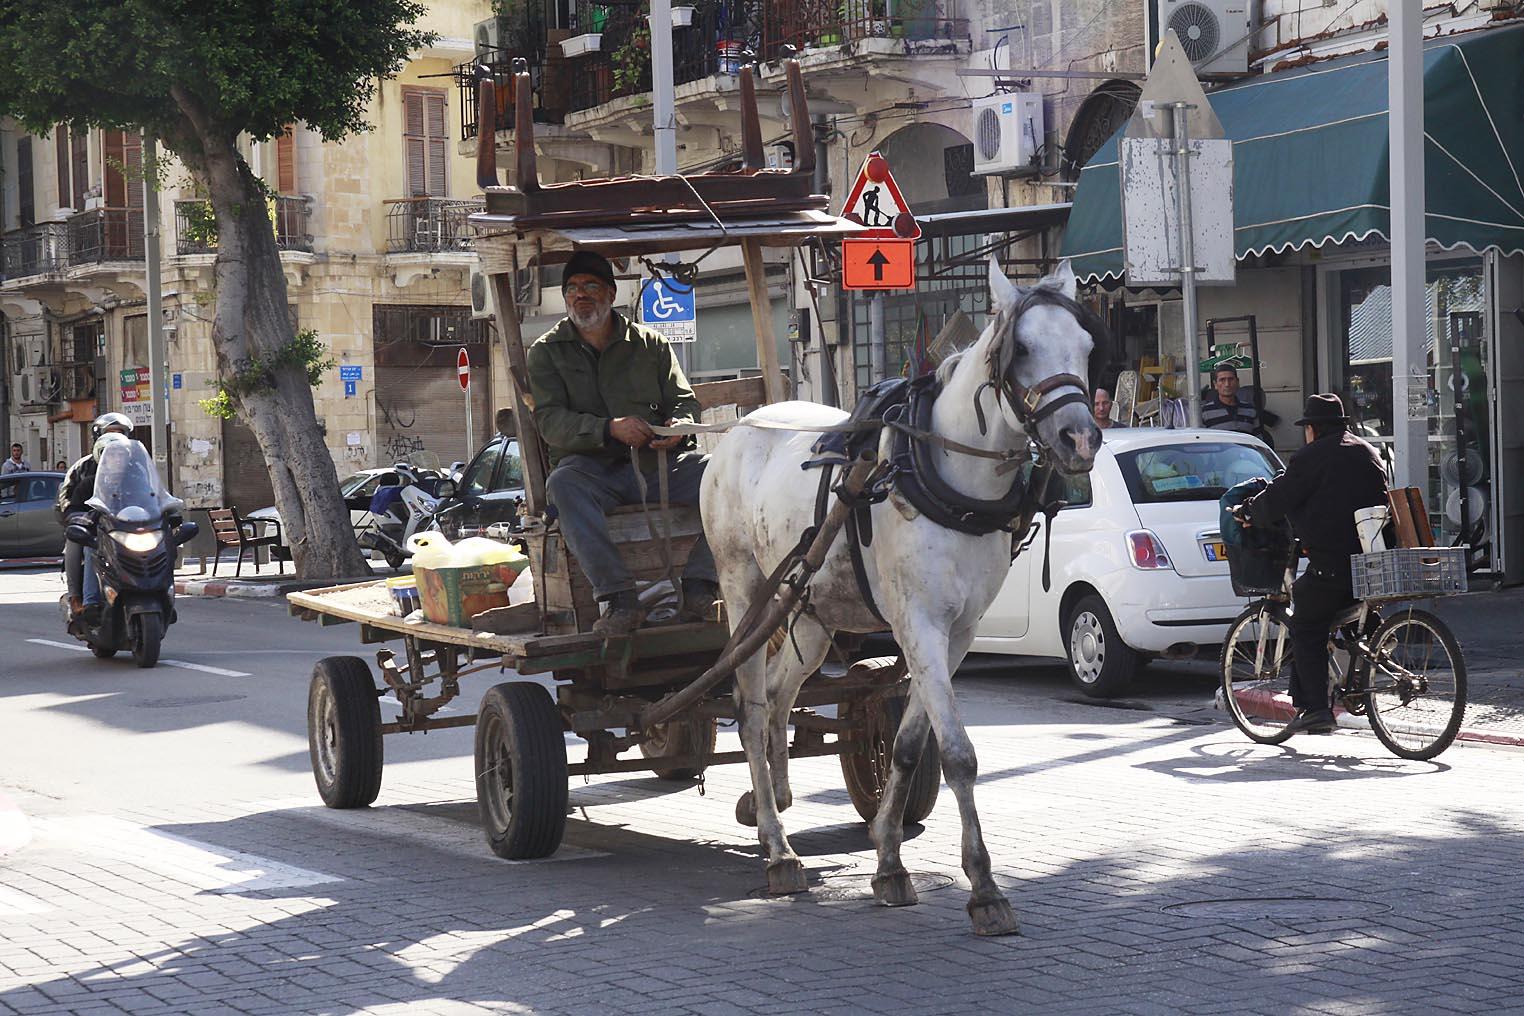 Occupied Tel Aviv